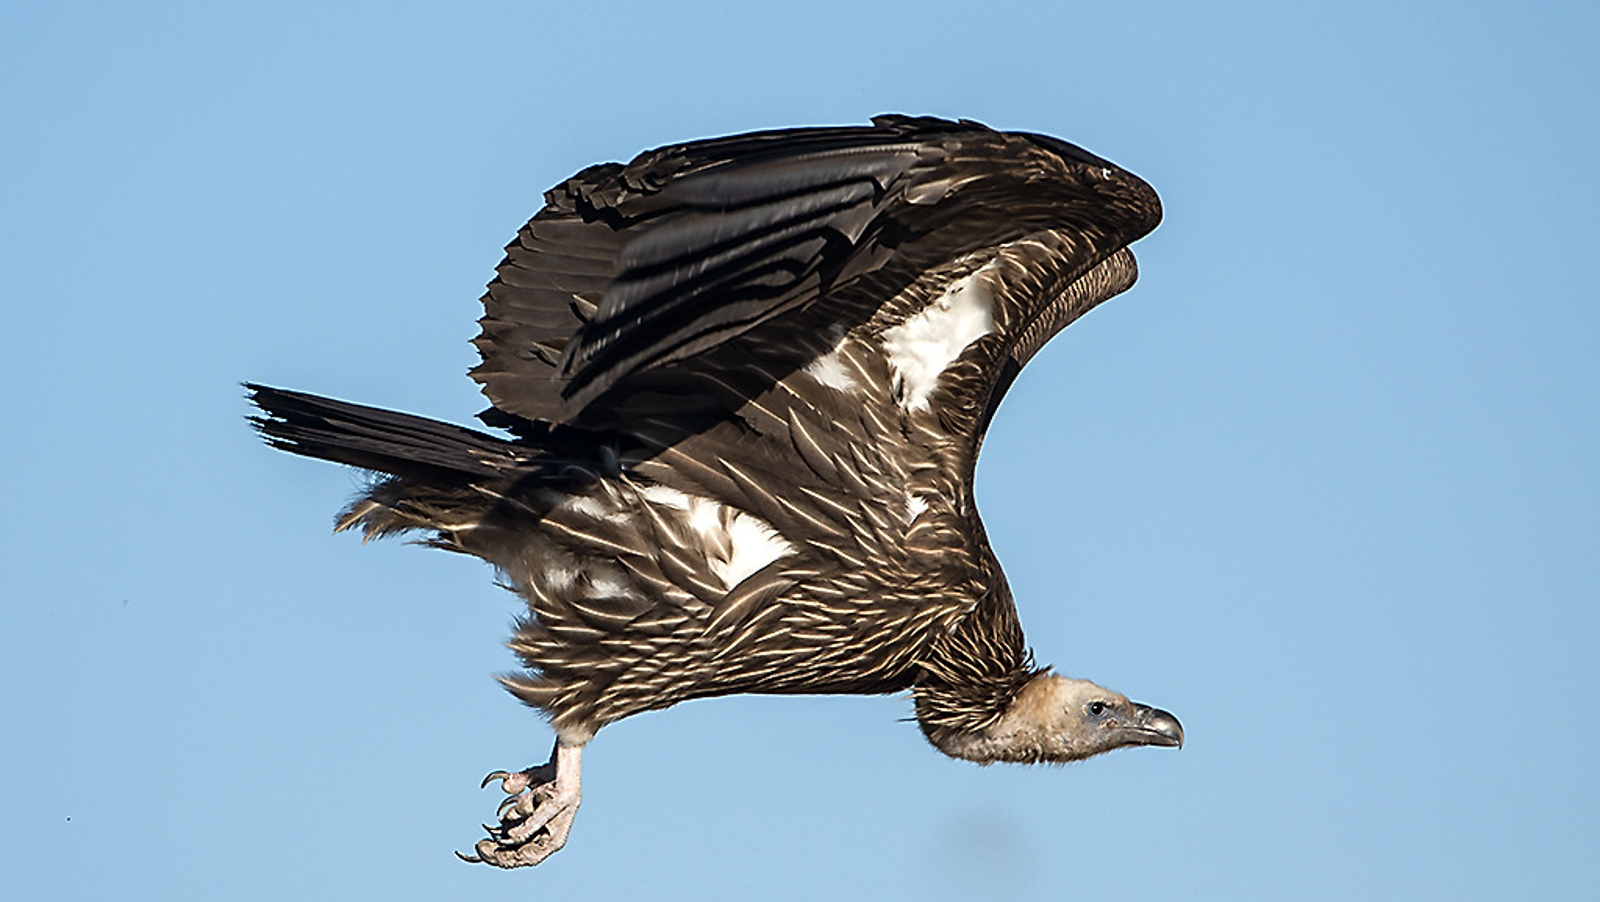 Vultures in Decline